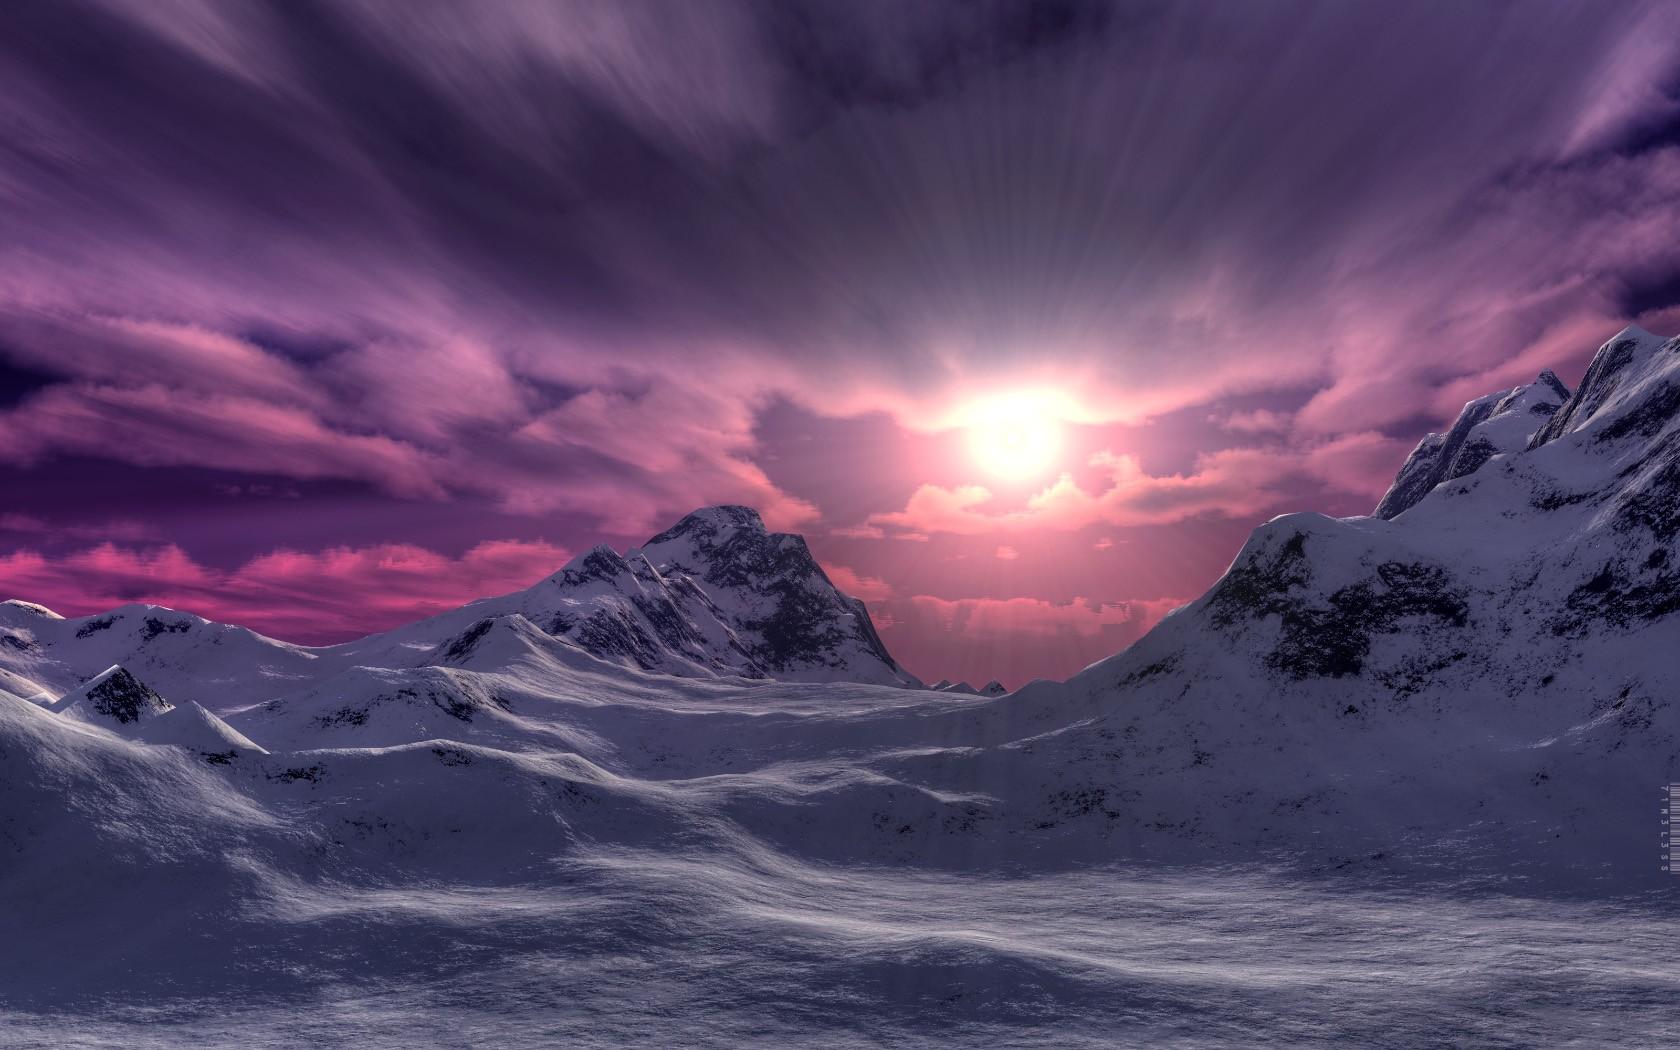 Purple 3d Wallpaper Fondos Para Android Especial Landscapes Paisajes Adnfriki